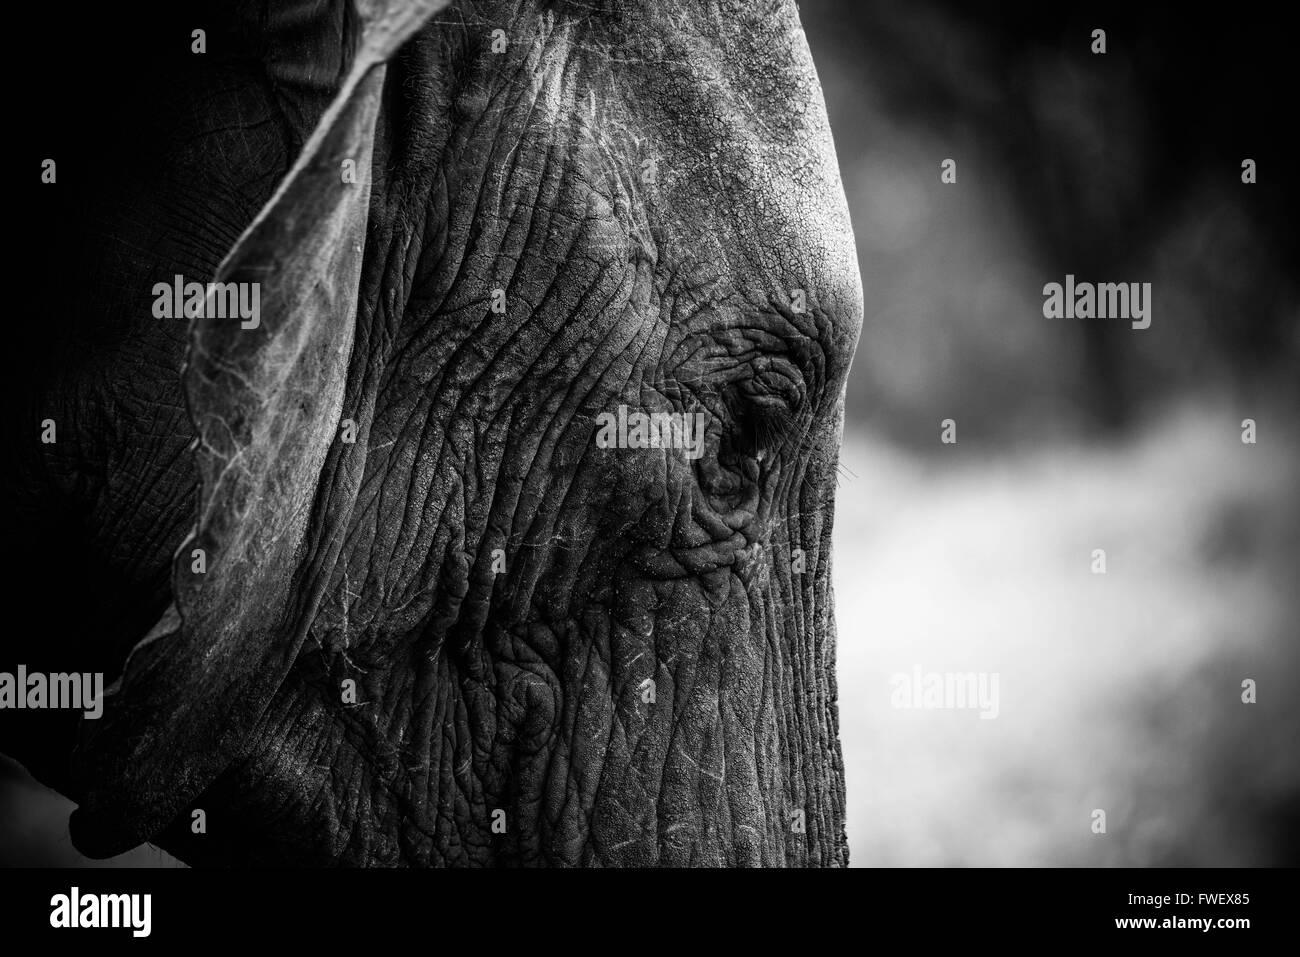 Elephant captured during safari in Tarangire, Tanzania - Stock Image